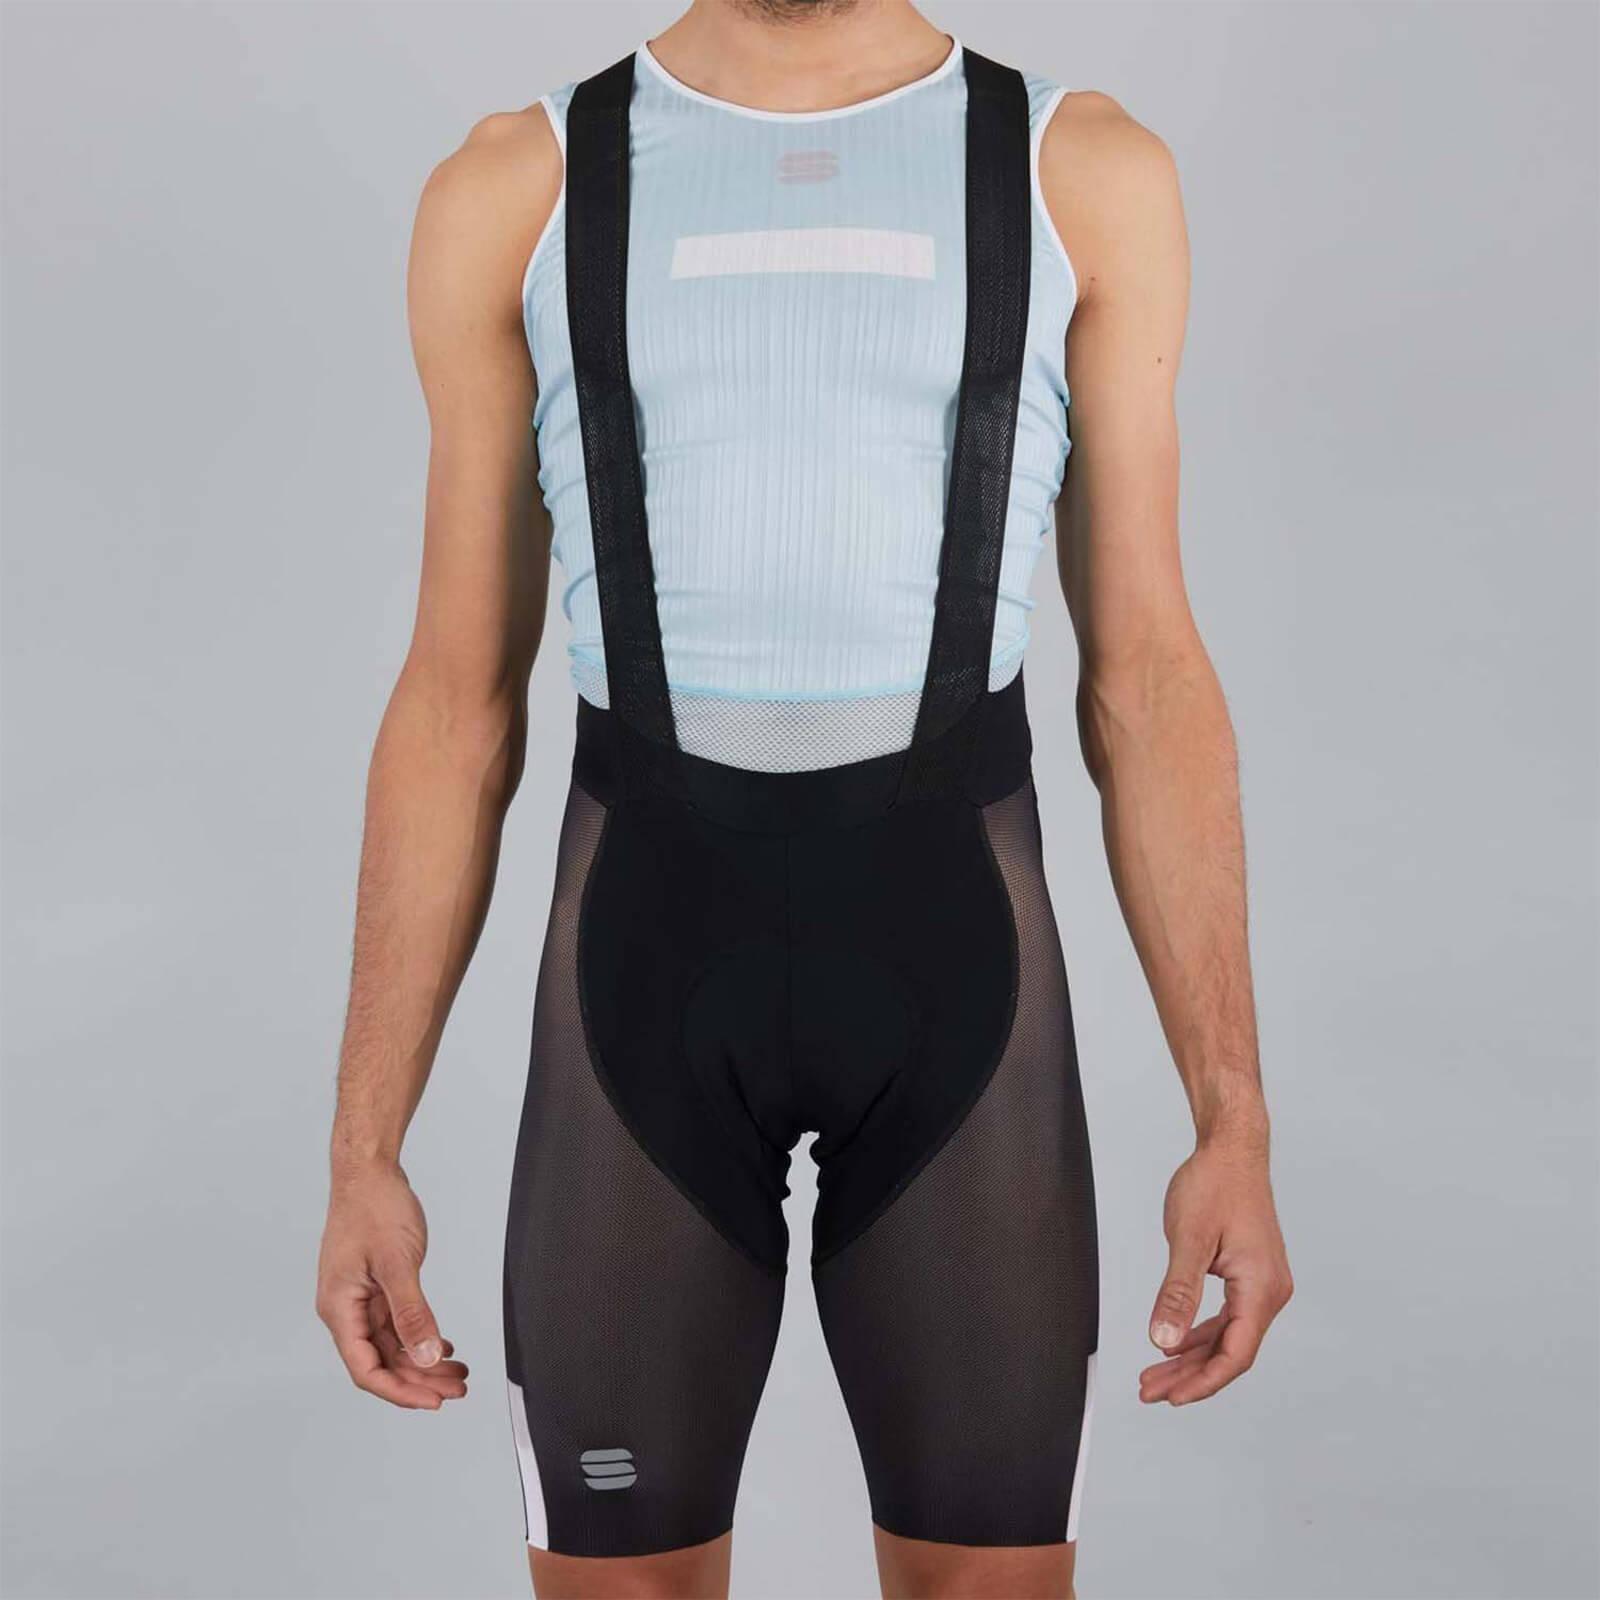 Sportful BodyFit Pro Air Bib Shorts - XXL - Black/White